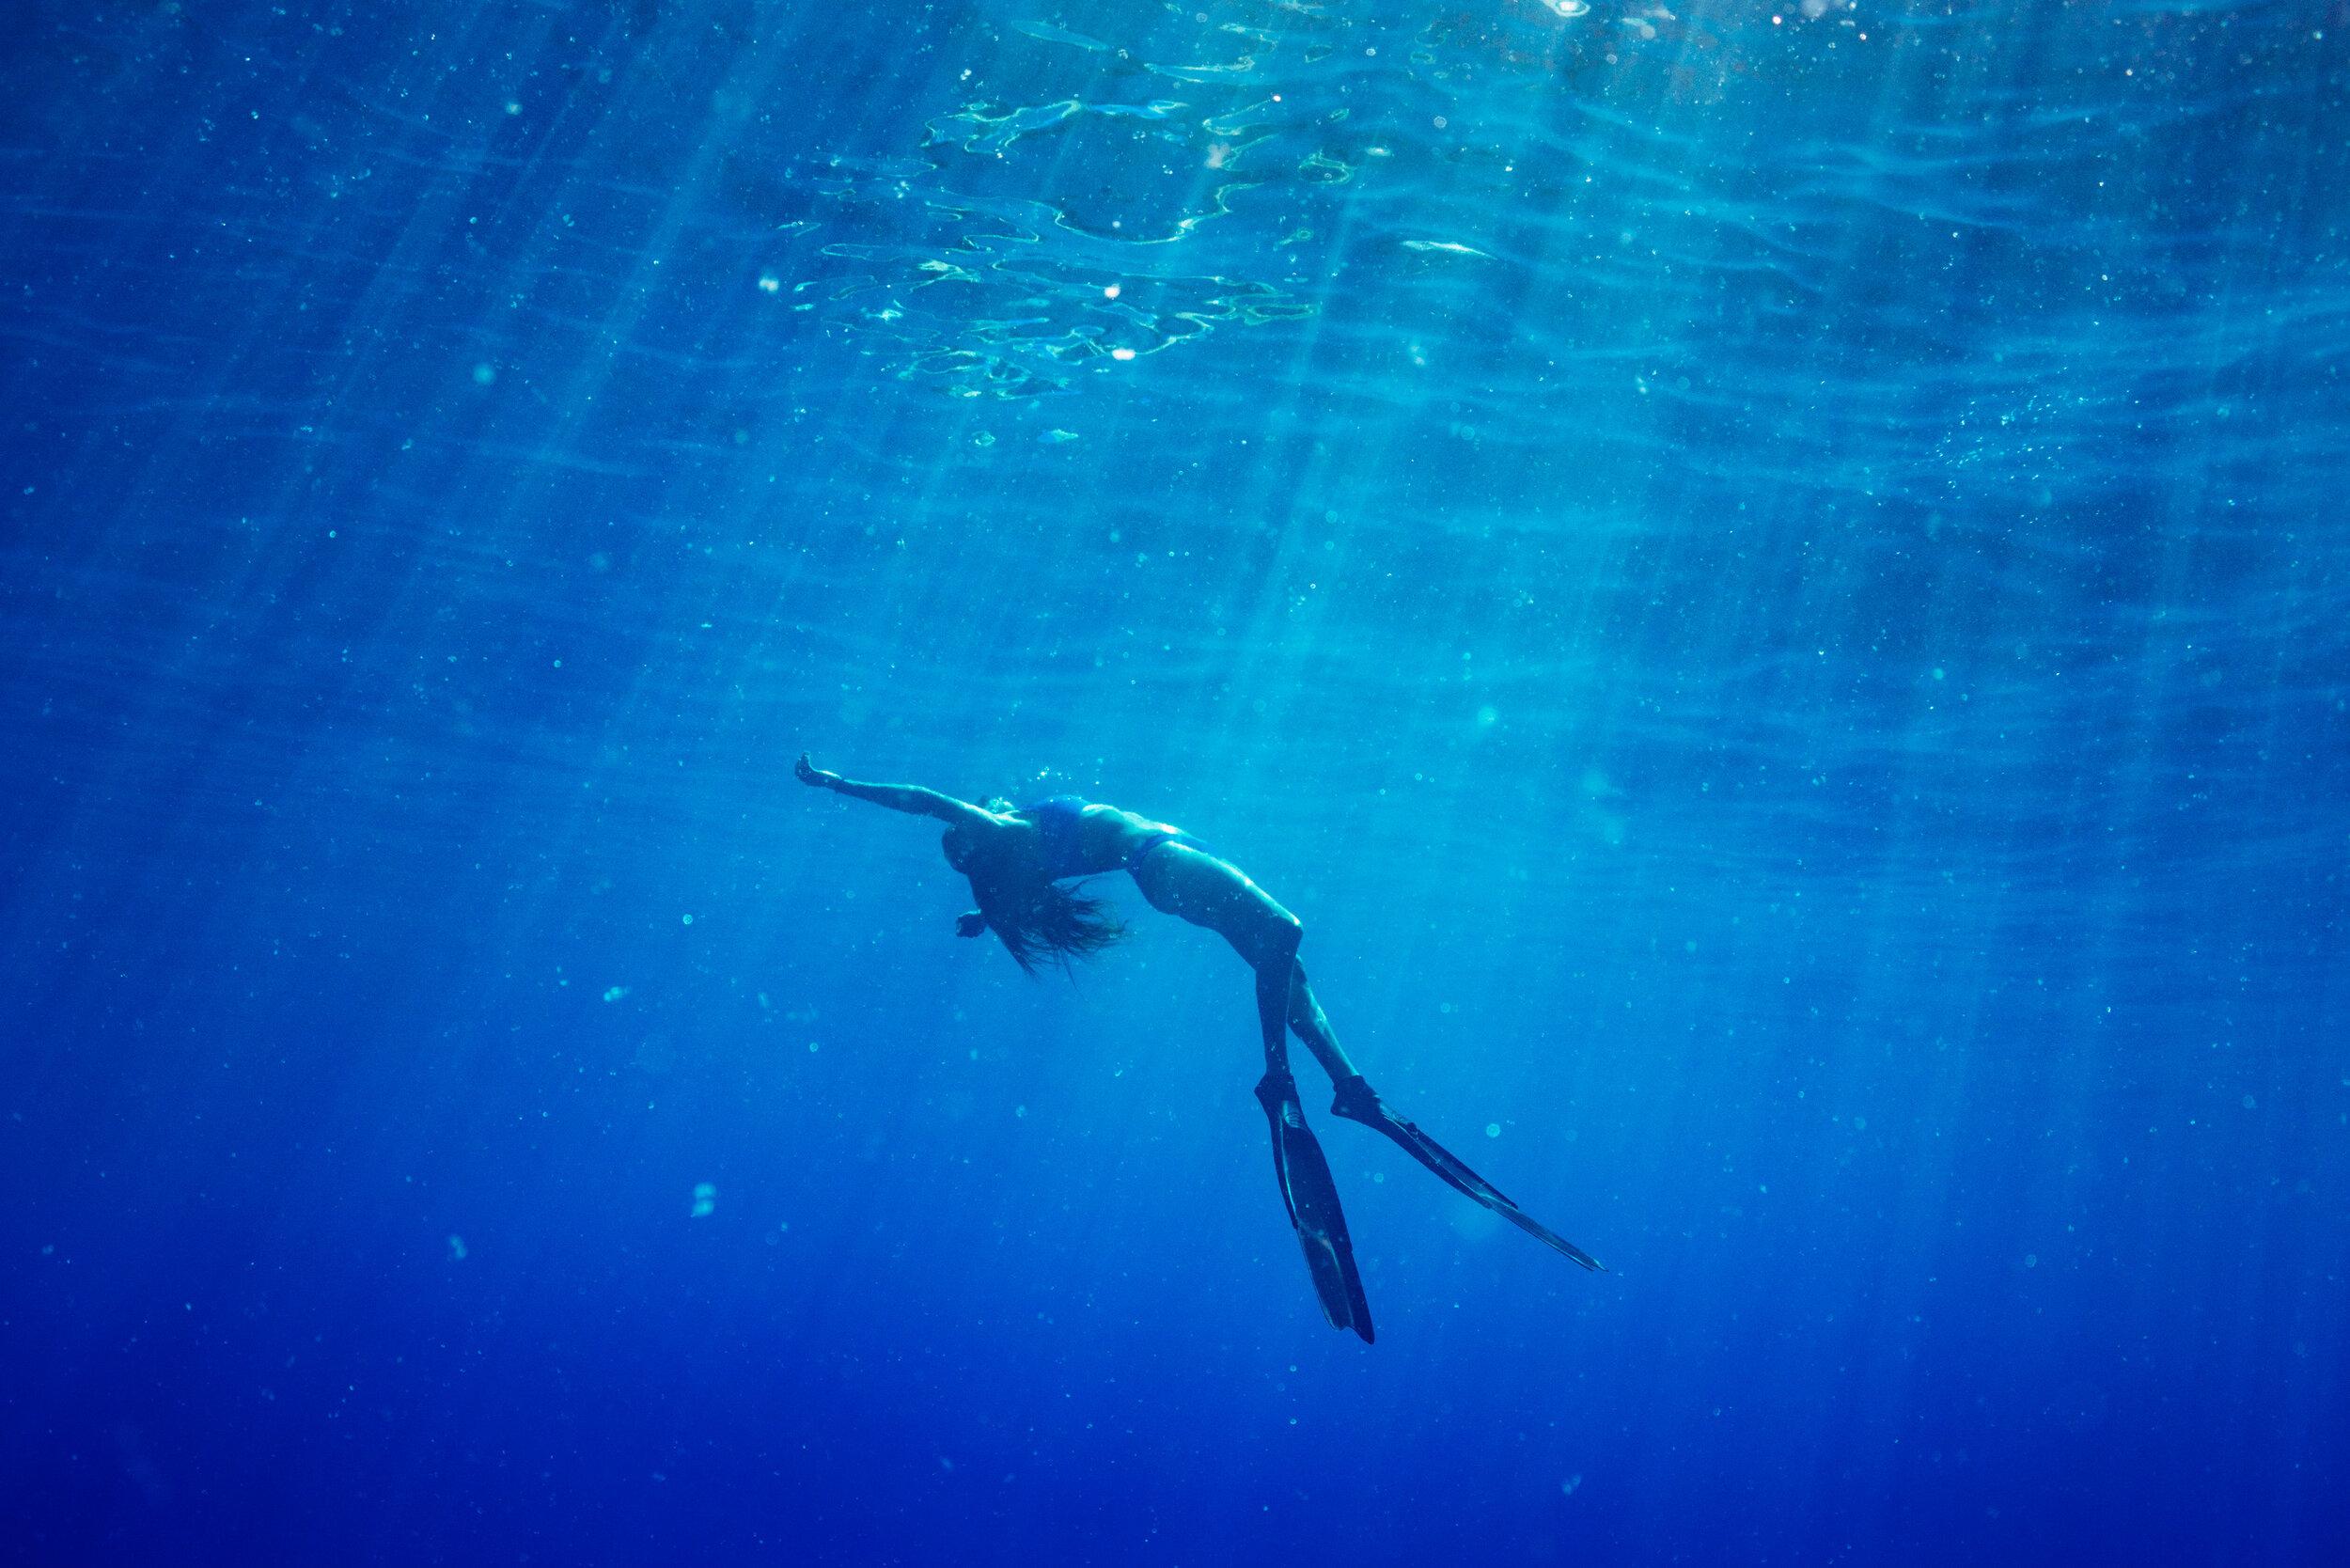 Backcountry - Summer Swim